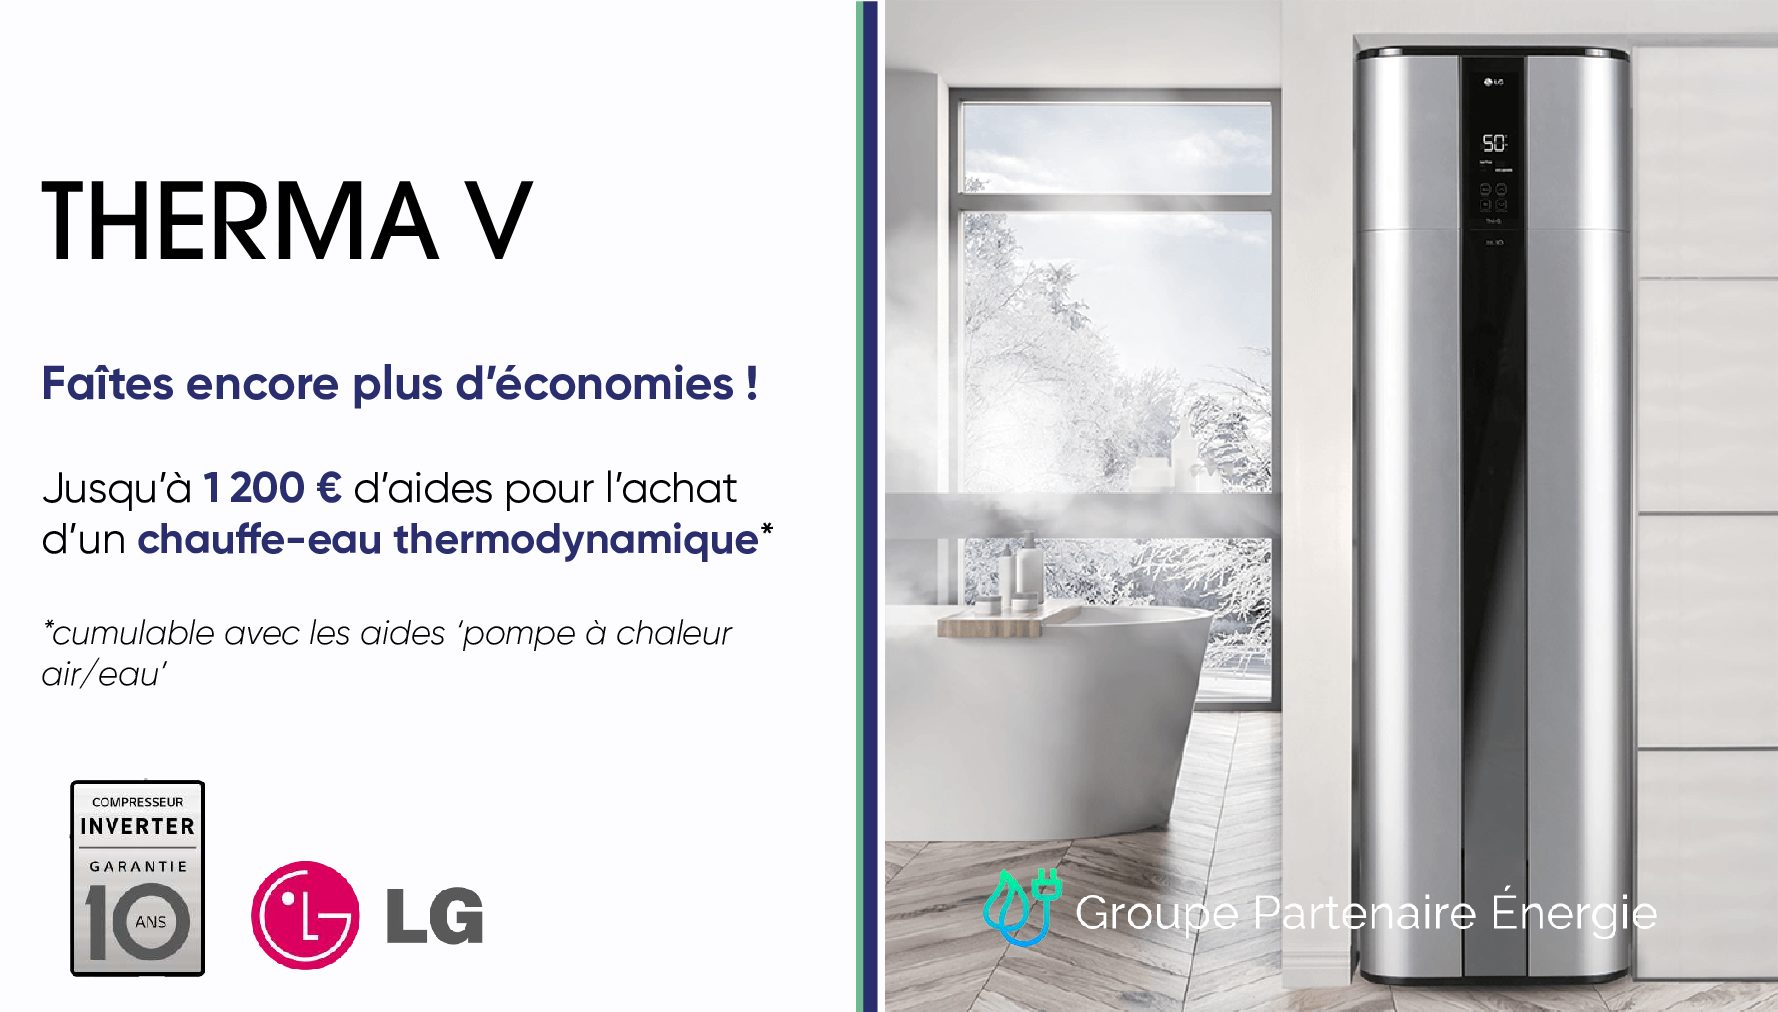 LG Therma V Chauffe-eau thermodynamique